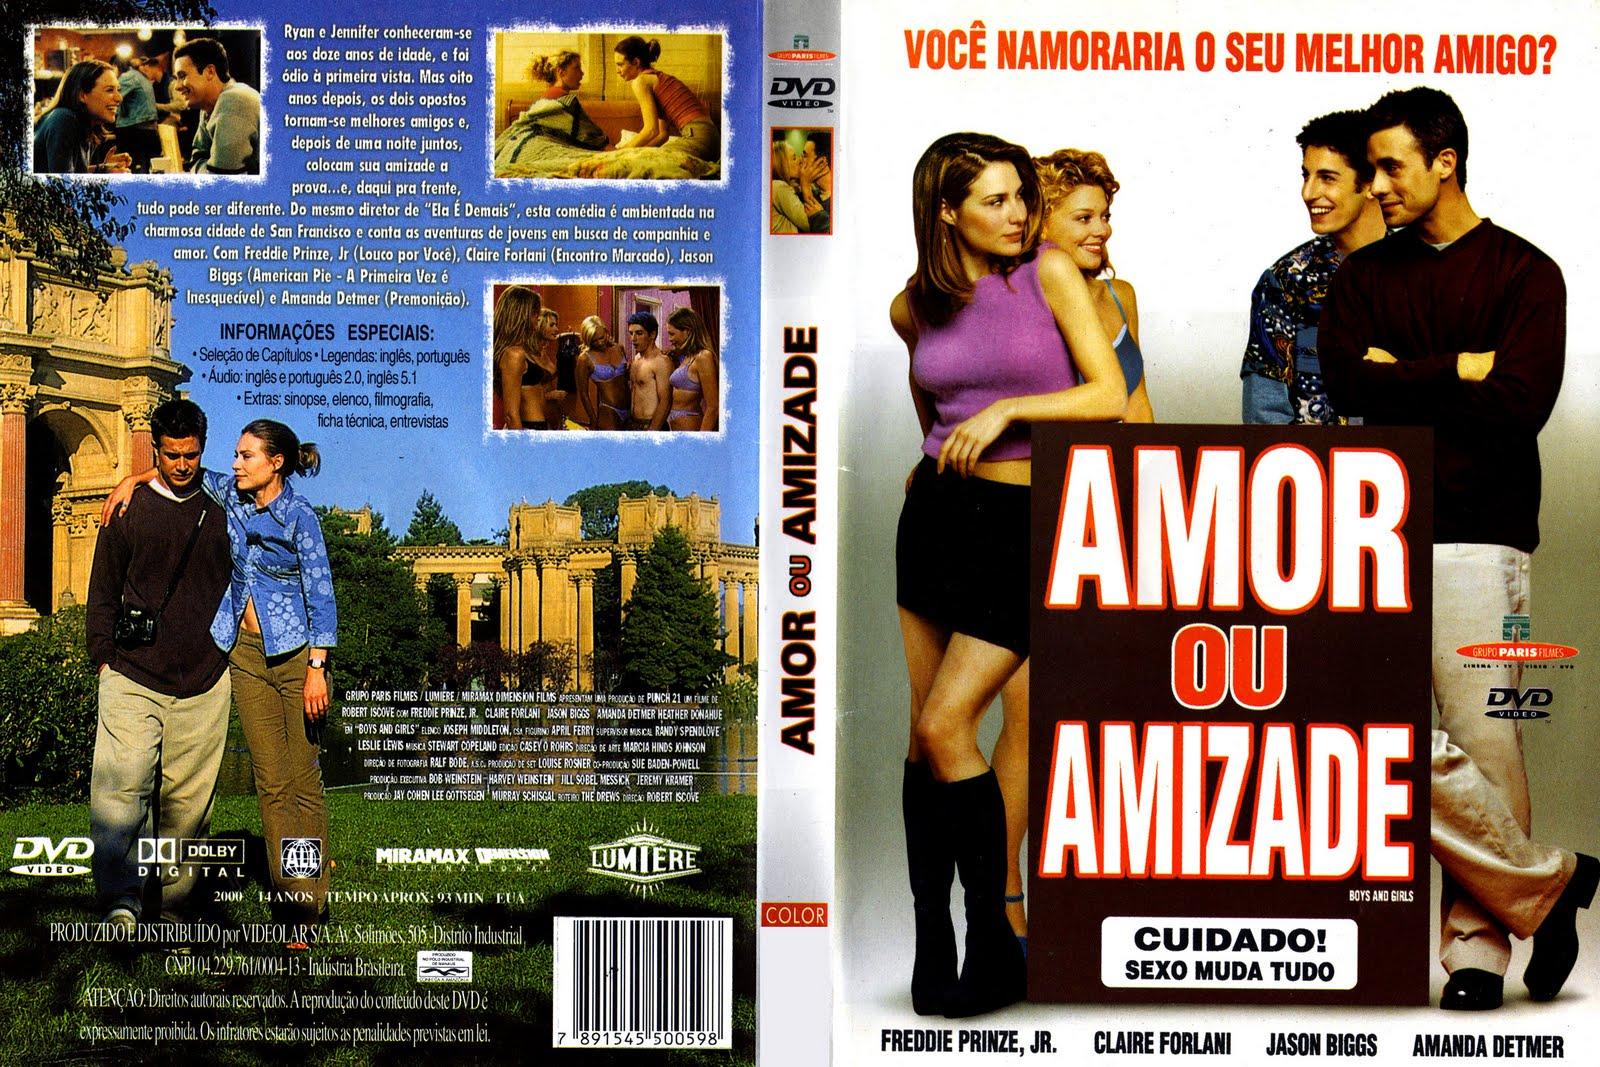 http://4.bp.blogspot.com/_avx0CDv74_c/TCo-4vMpBLI/AAAAAAAAACM/zjVCTboj6Ac/s1600/Amor-Ou-Amizade.jpg